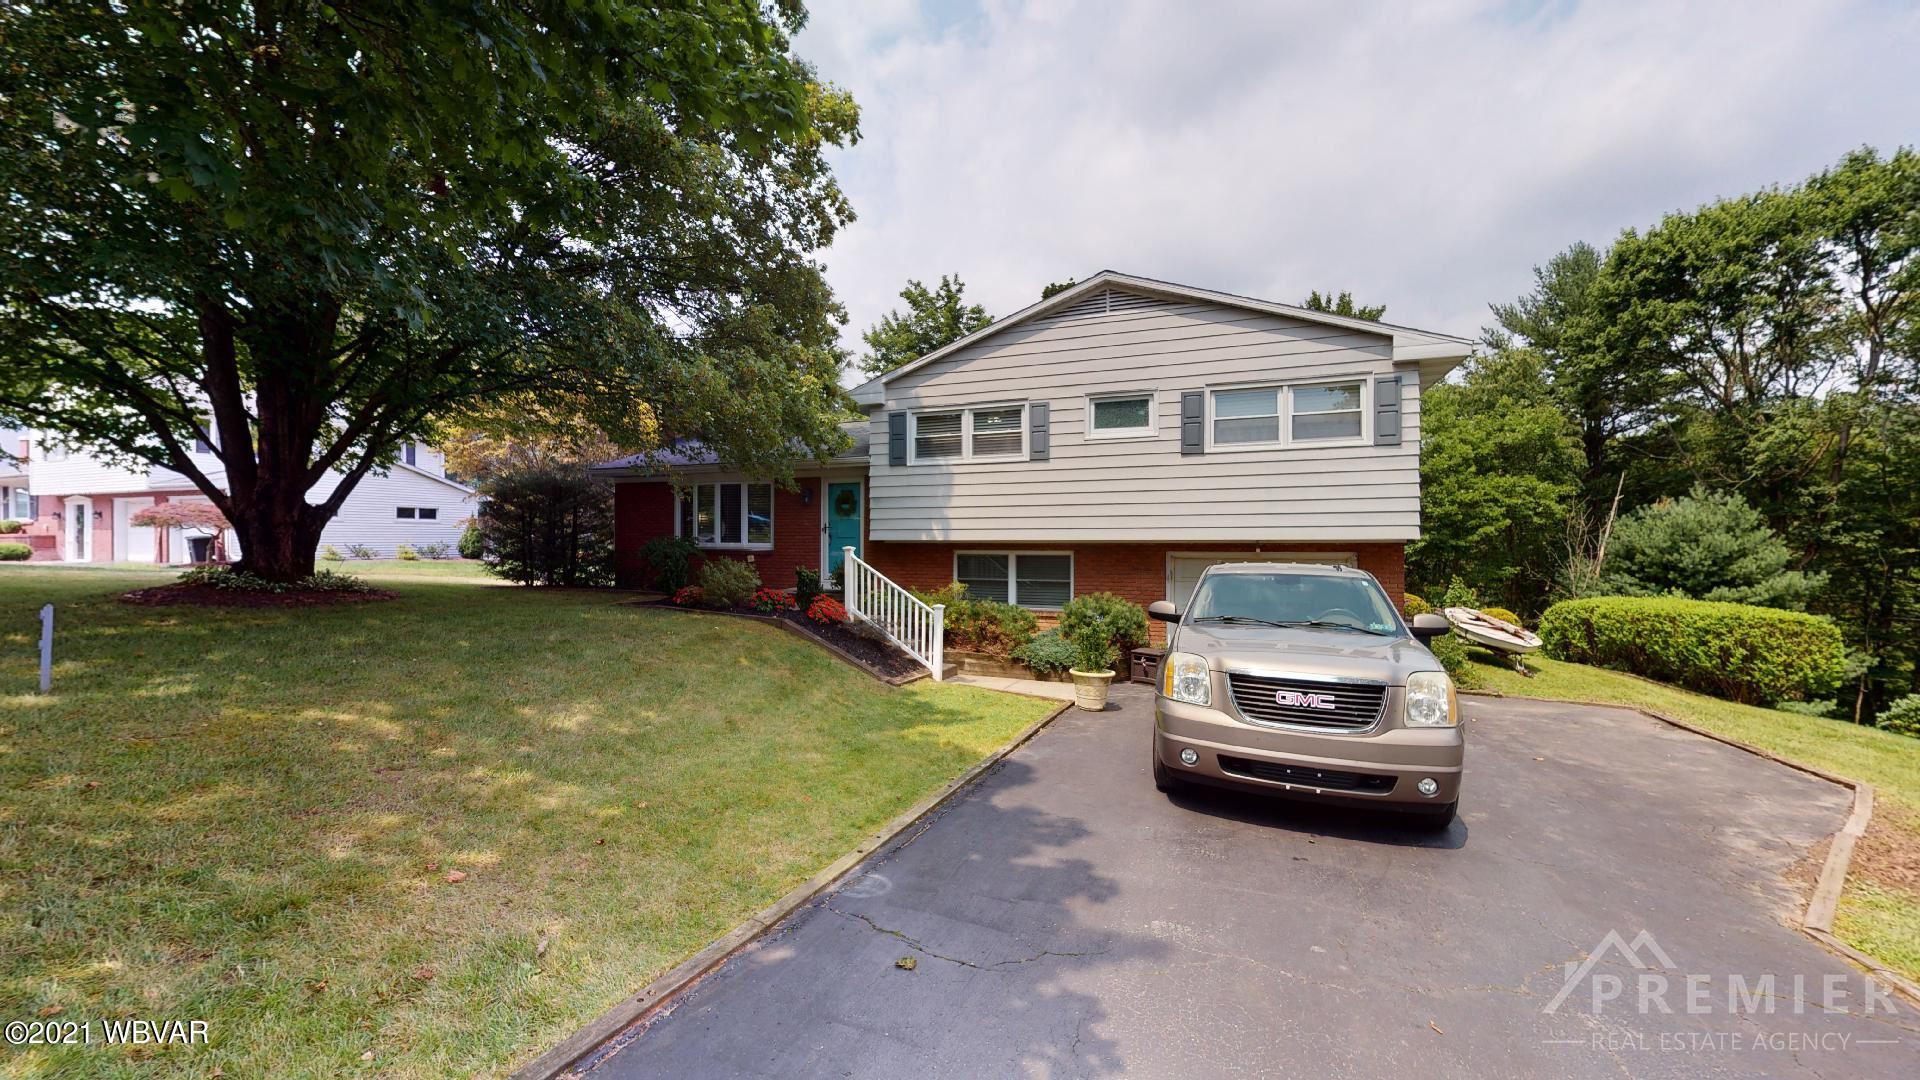 48 OVERHILL ROAD, Williamsport, PA 17701 - #: WB-93071